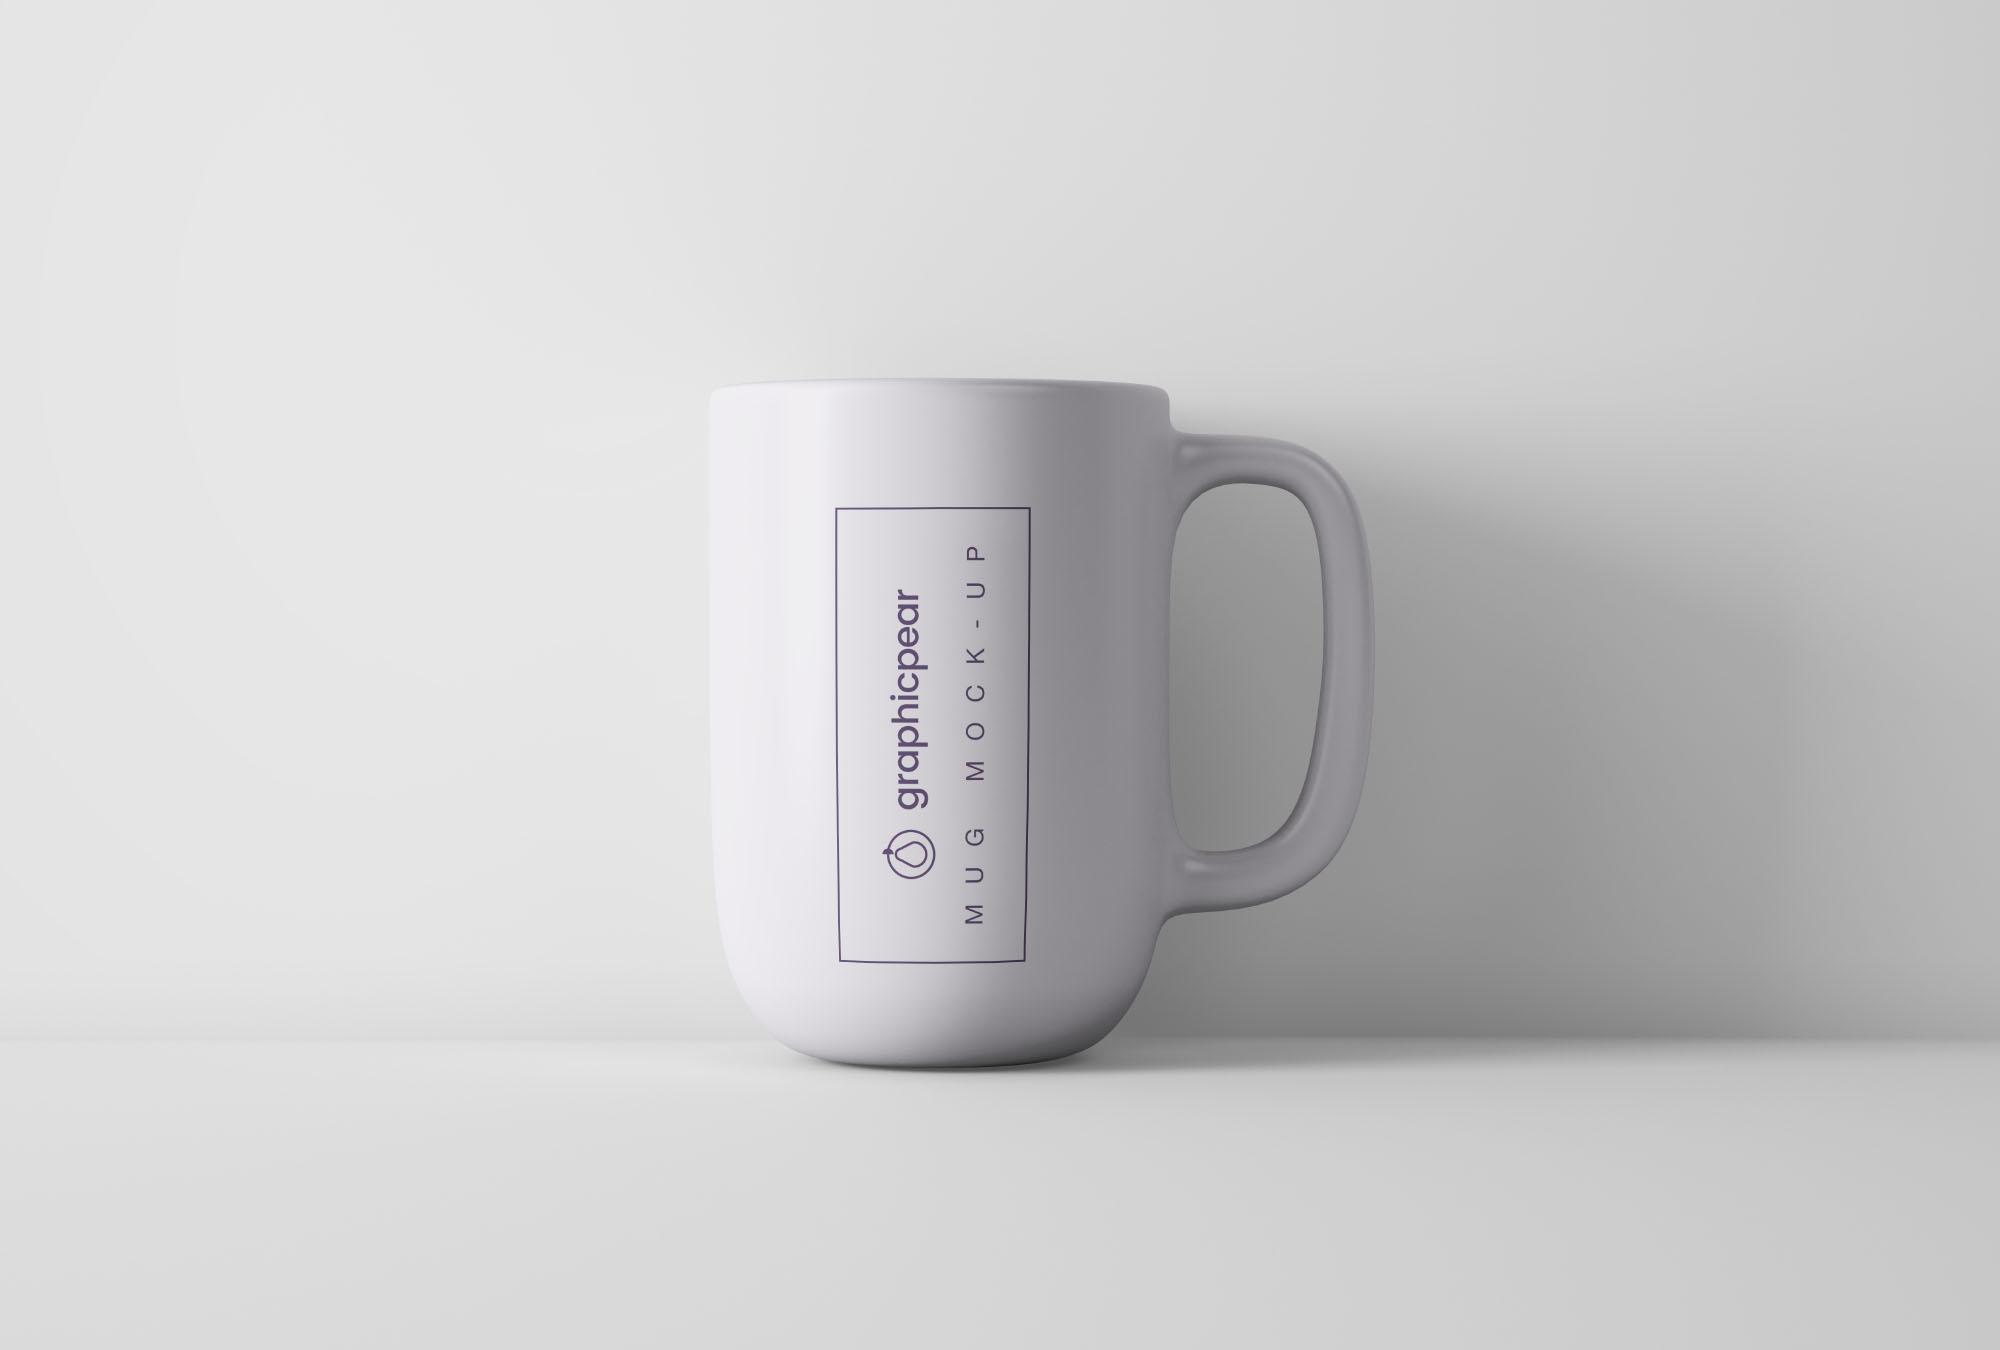 60 Realistic Coffee Cup Mug Psd Mockup Templates Decolore